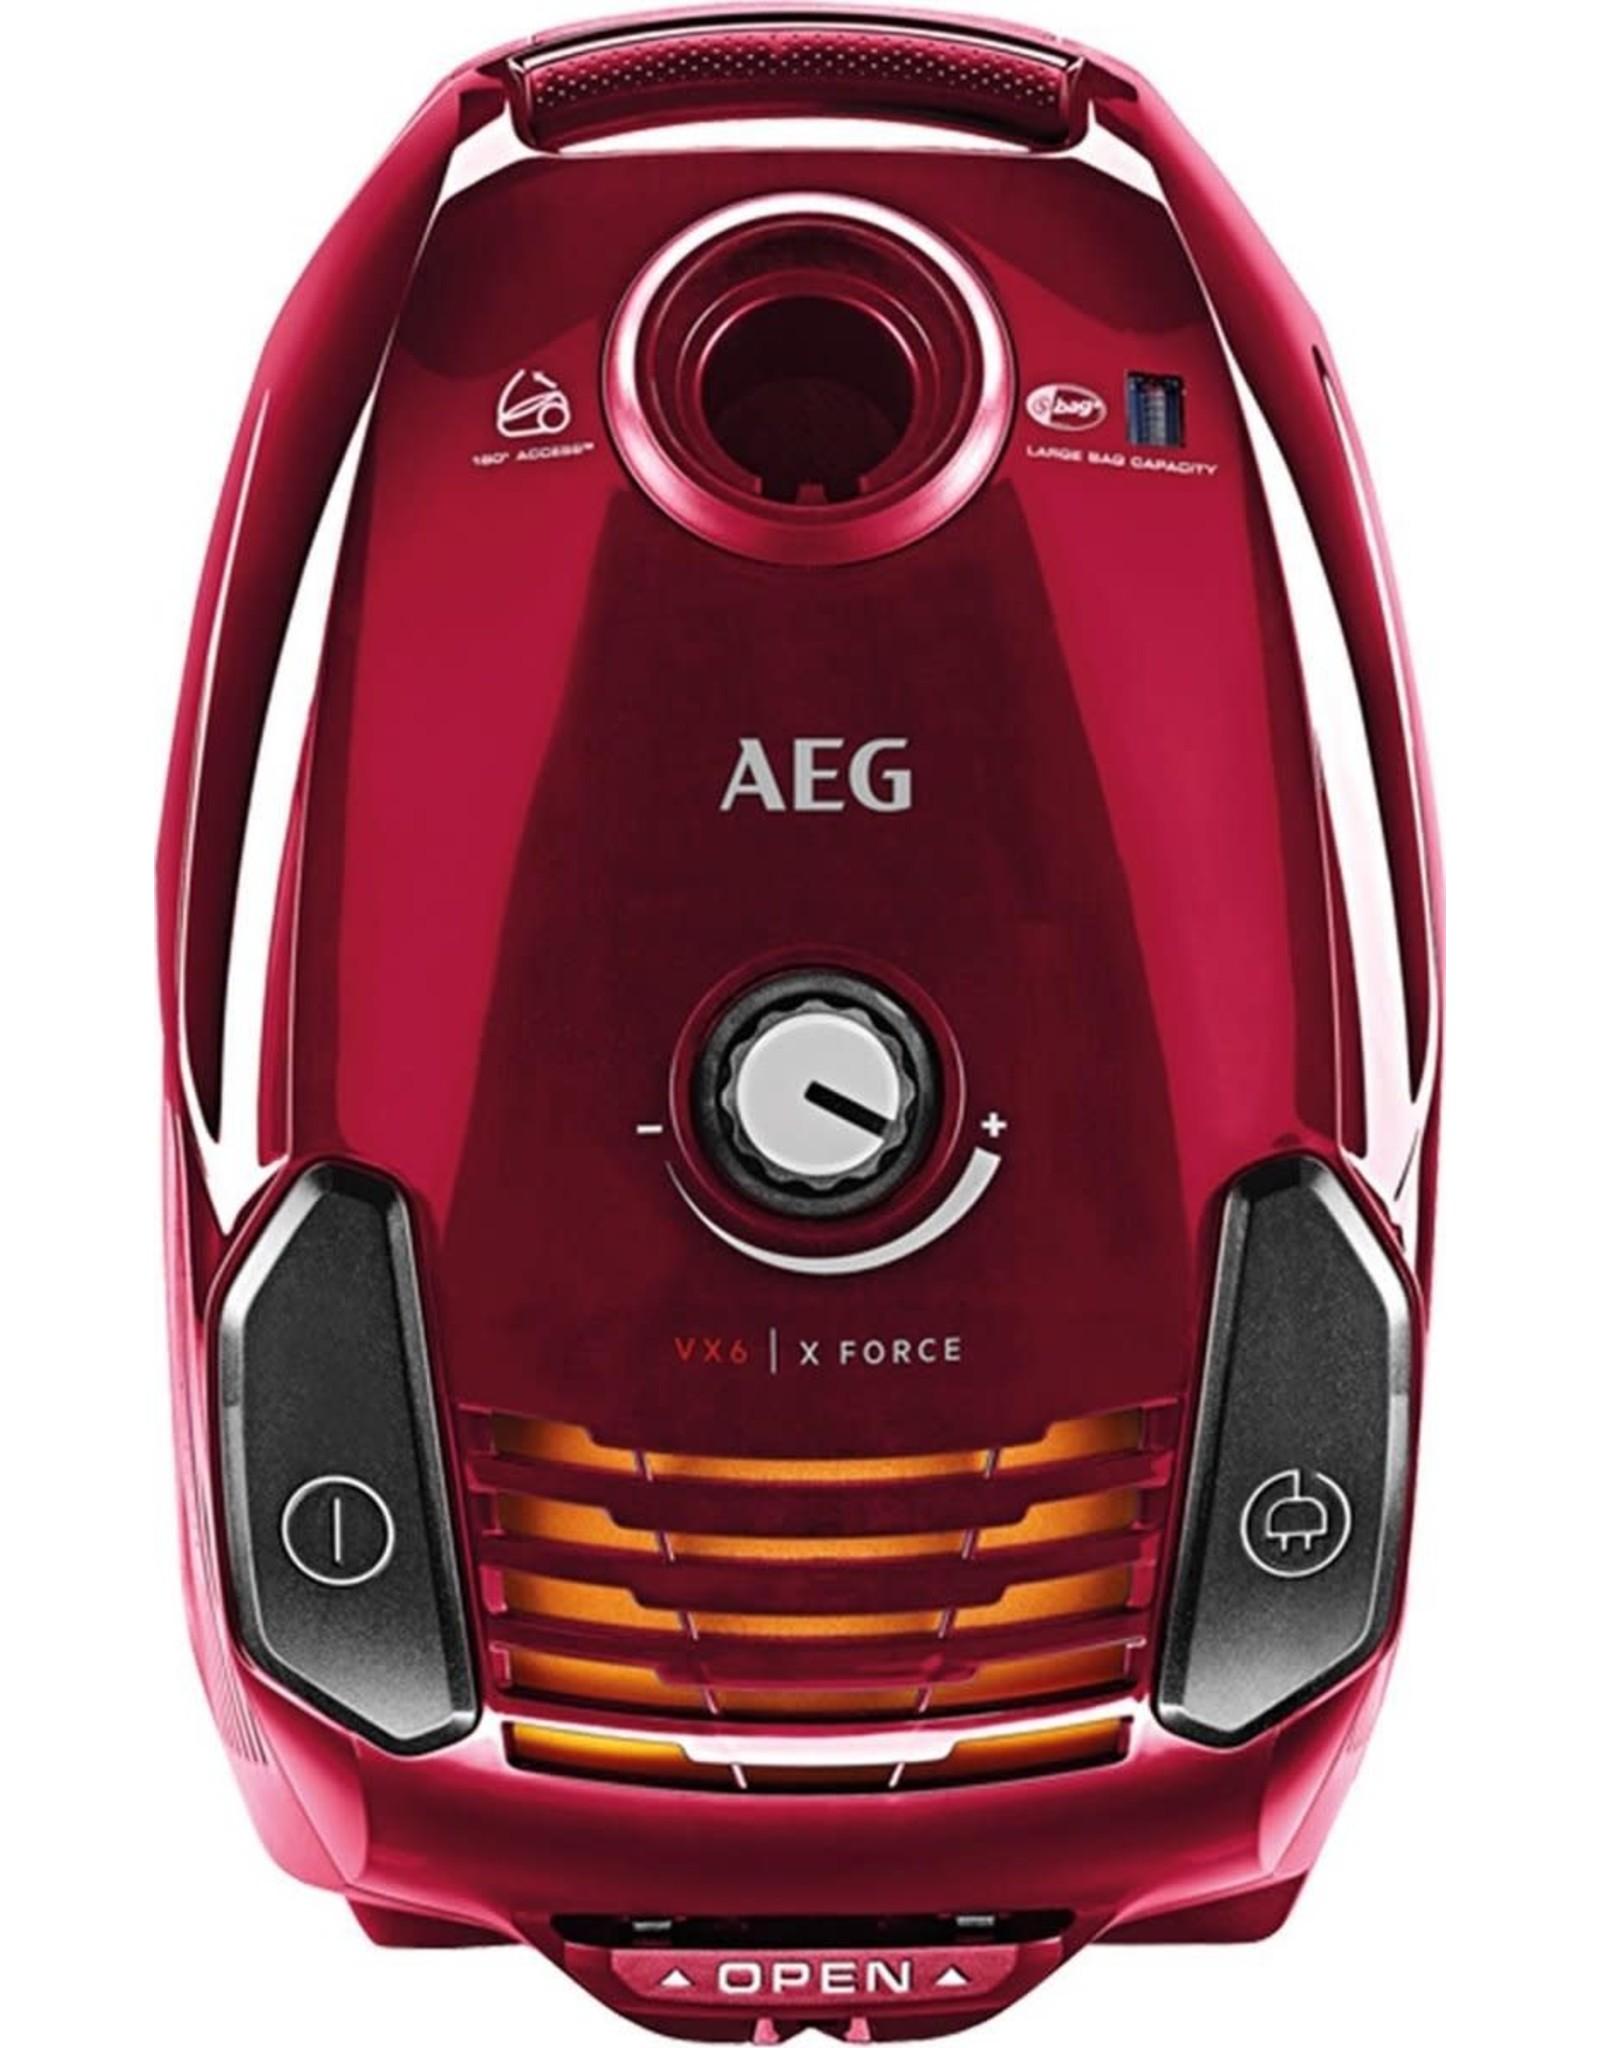 AEG AEG VX6-2-RR - Stofzuiger met zak